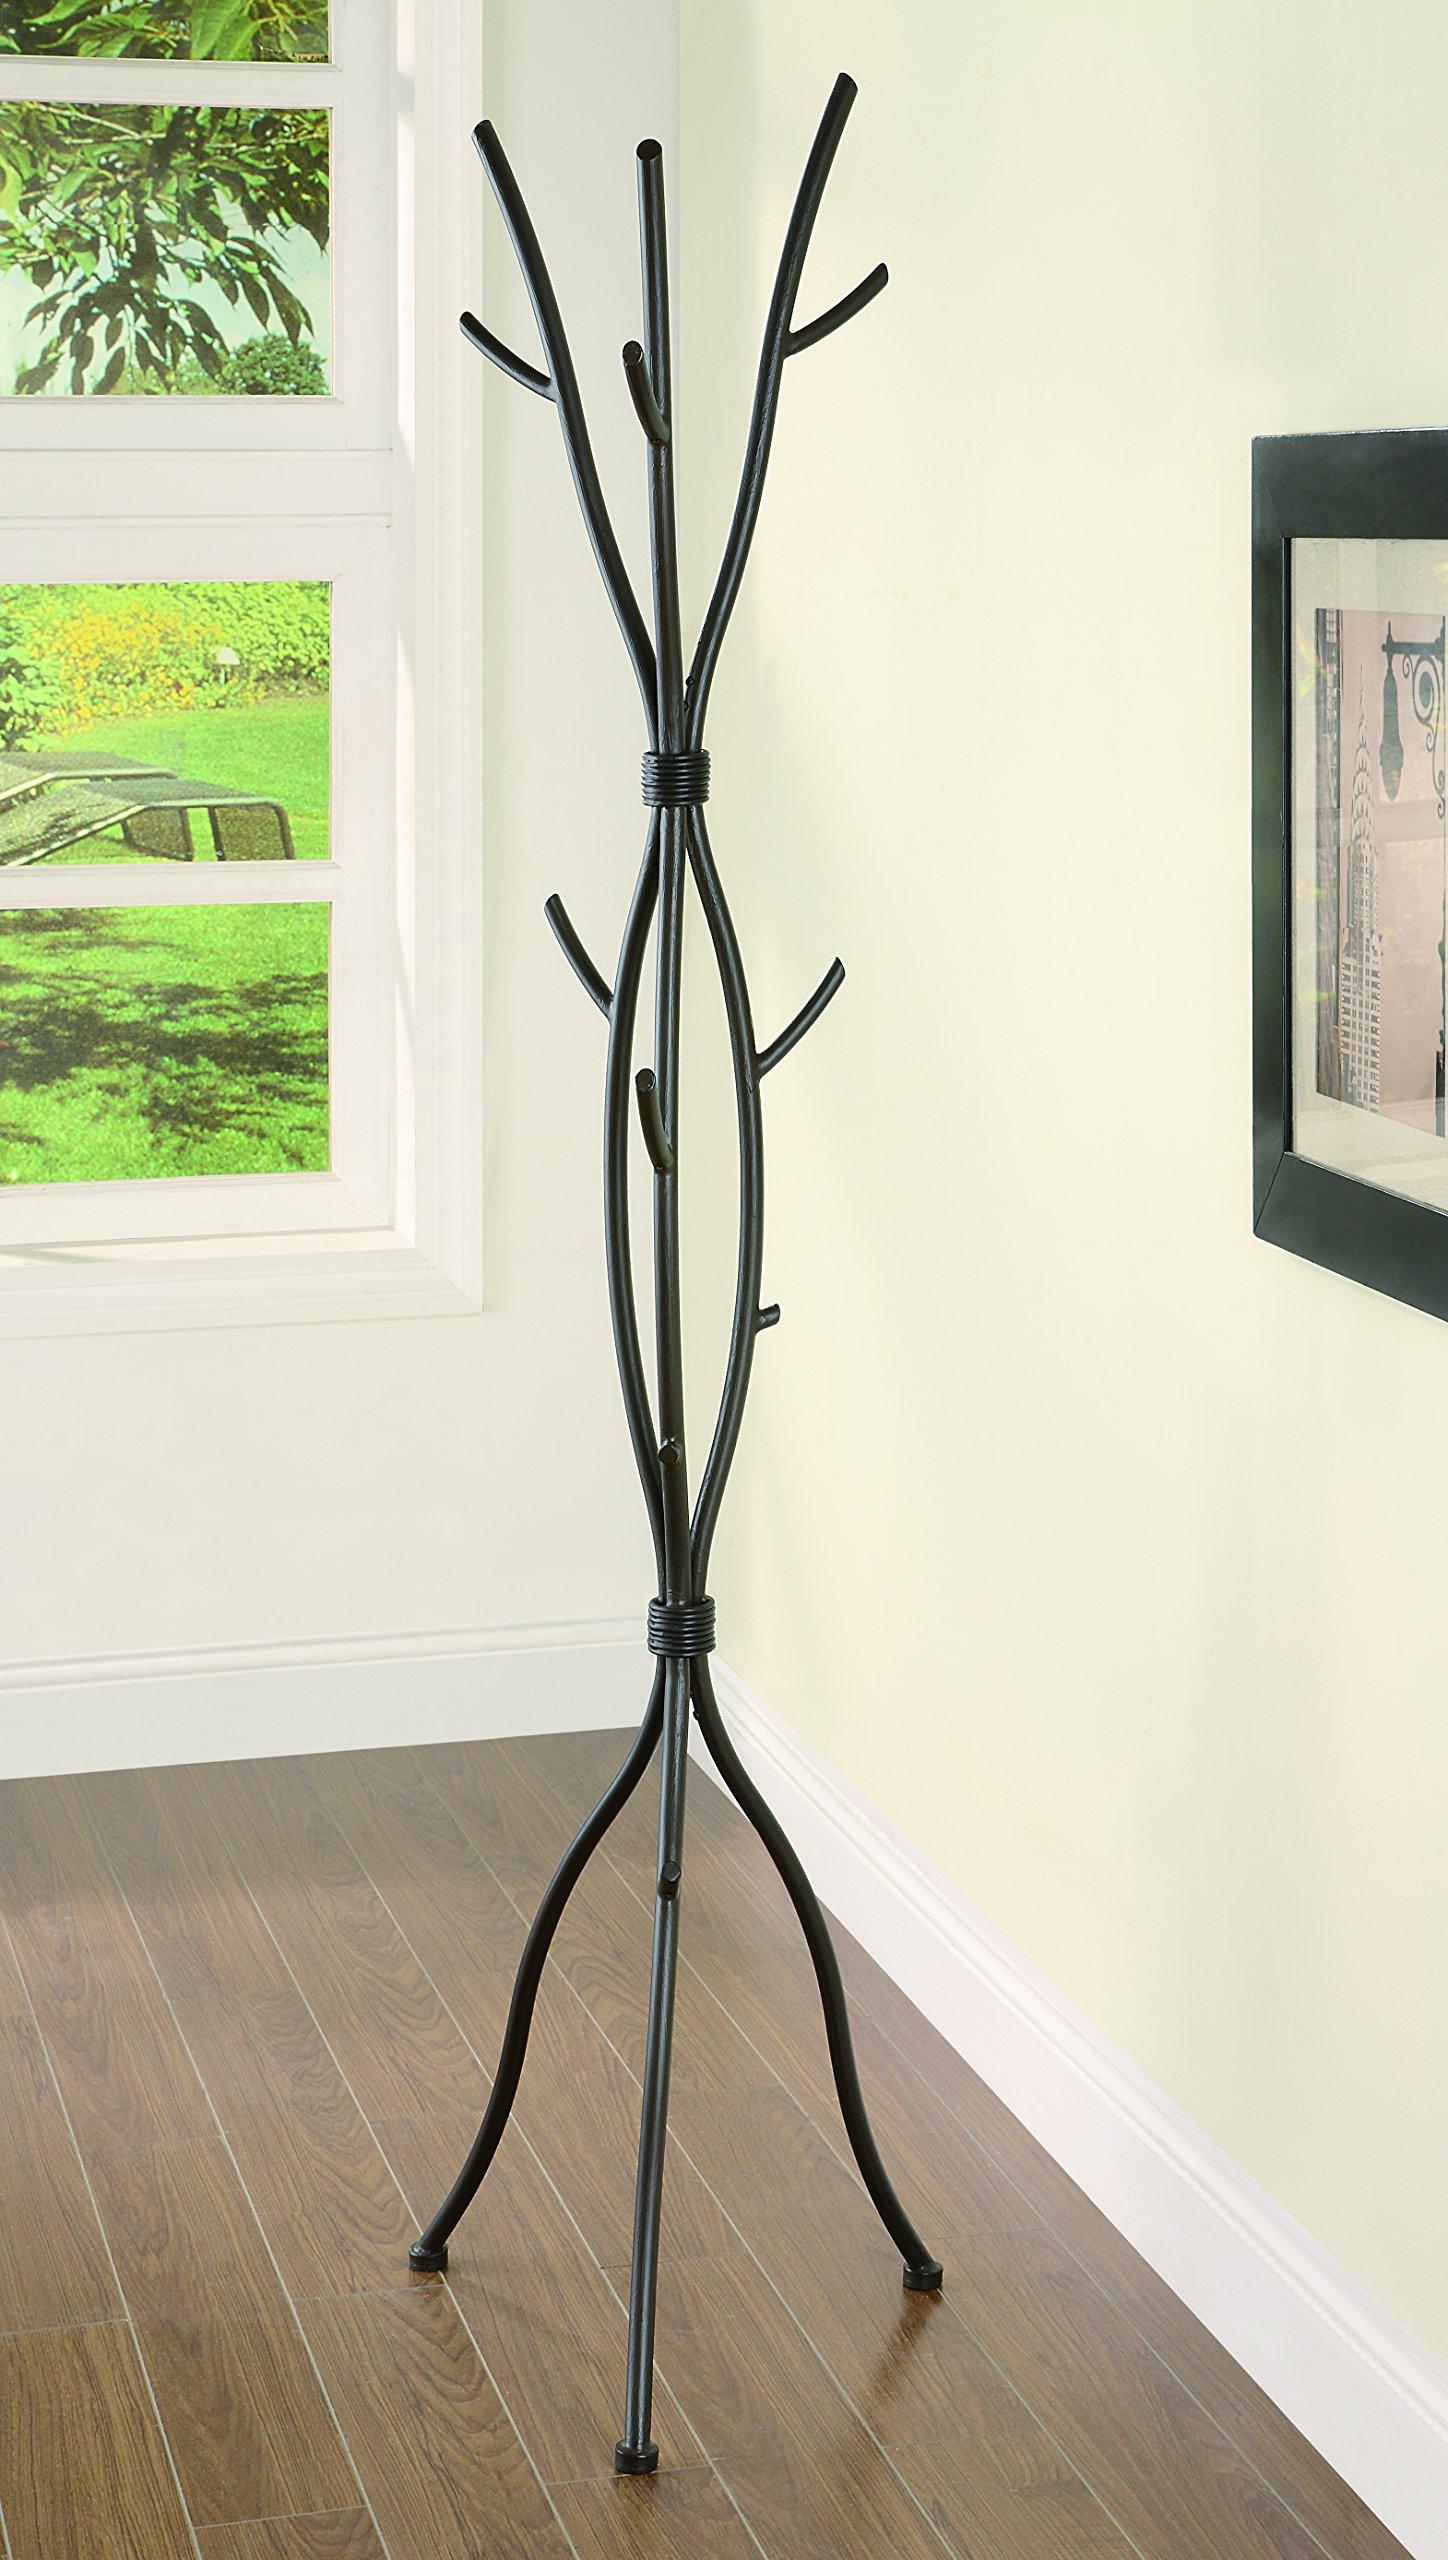 office coat hanger. Home Office Coat Hanger Modern Tree Hat Stand Rack Purse Holder Hook Metal Brown R